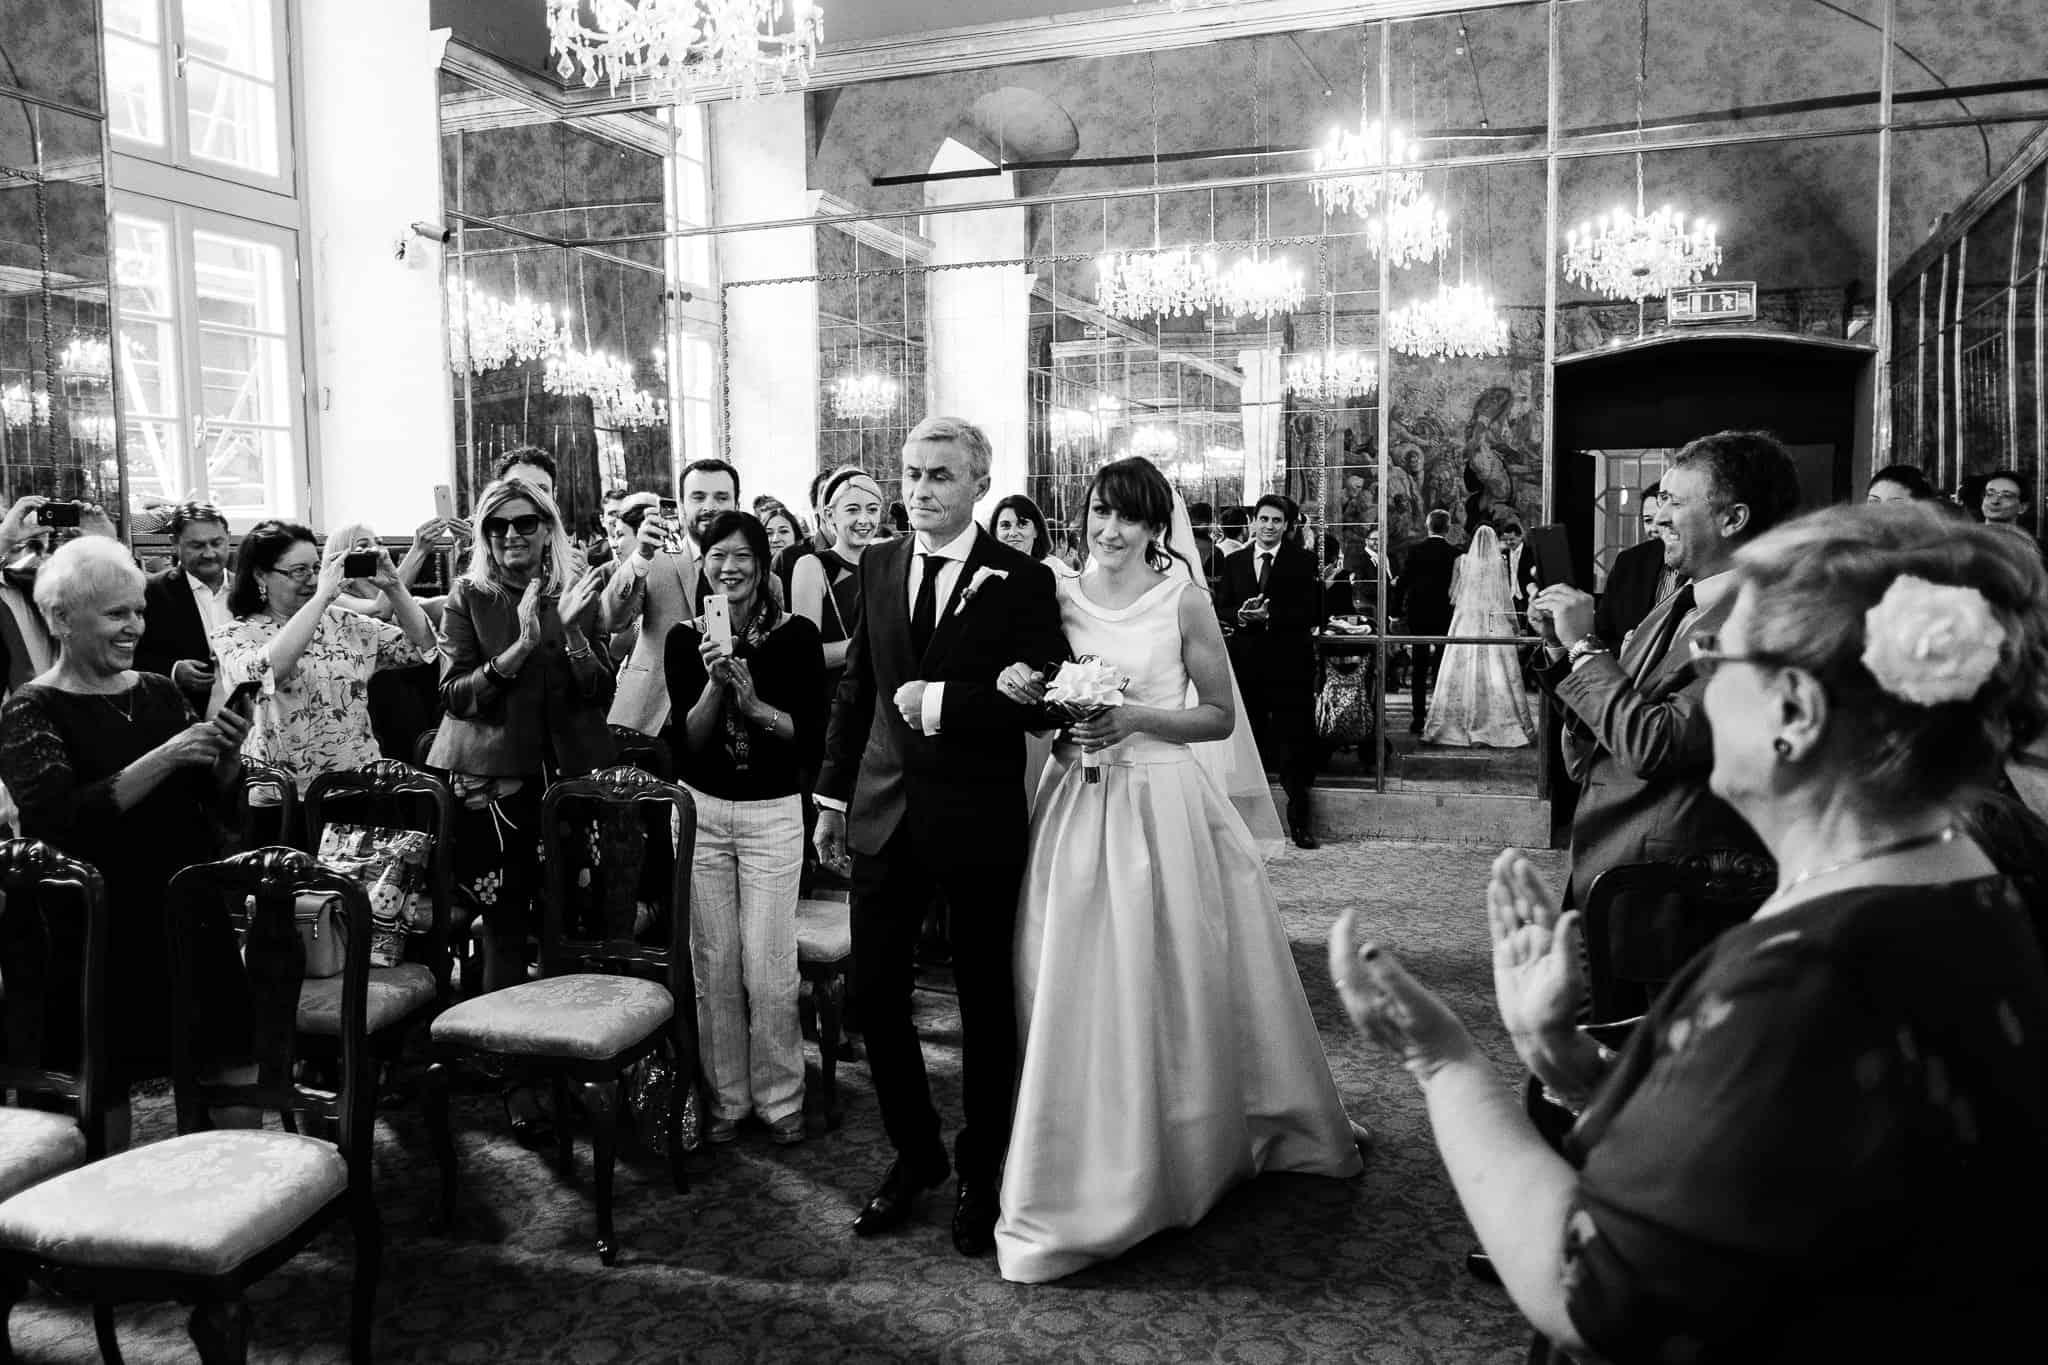 matrimonio Canter Milano San siro Luca rossi wedding reportage 0028